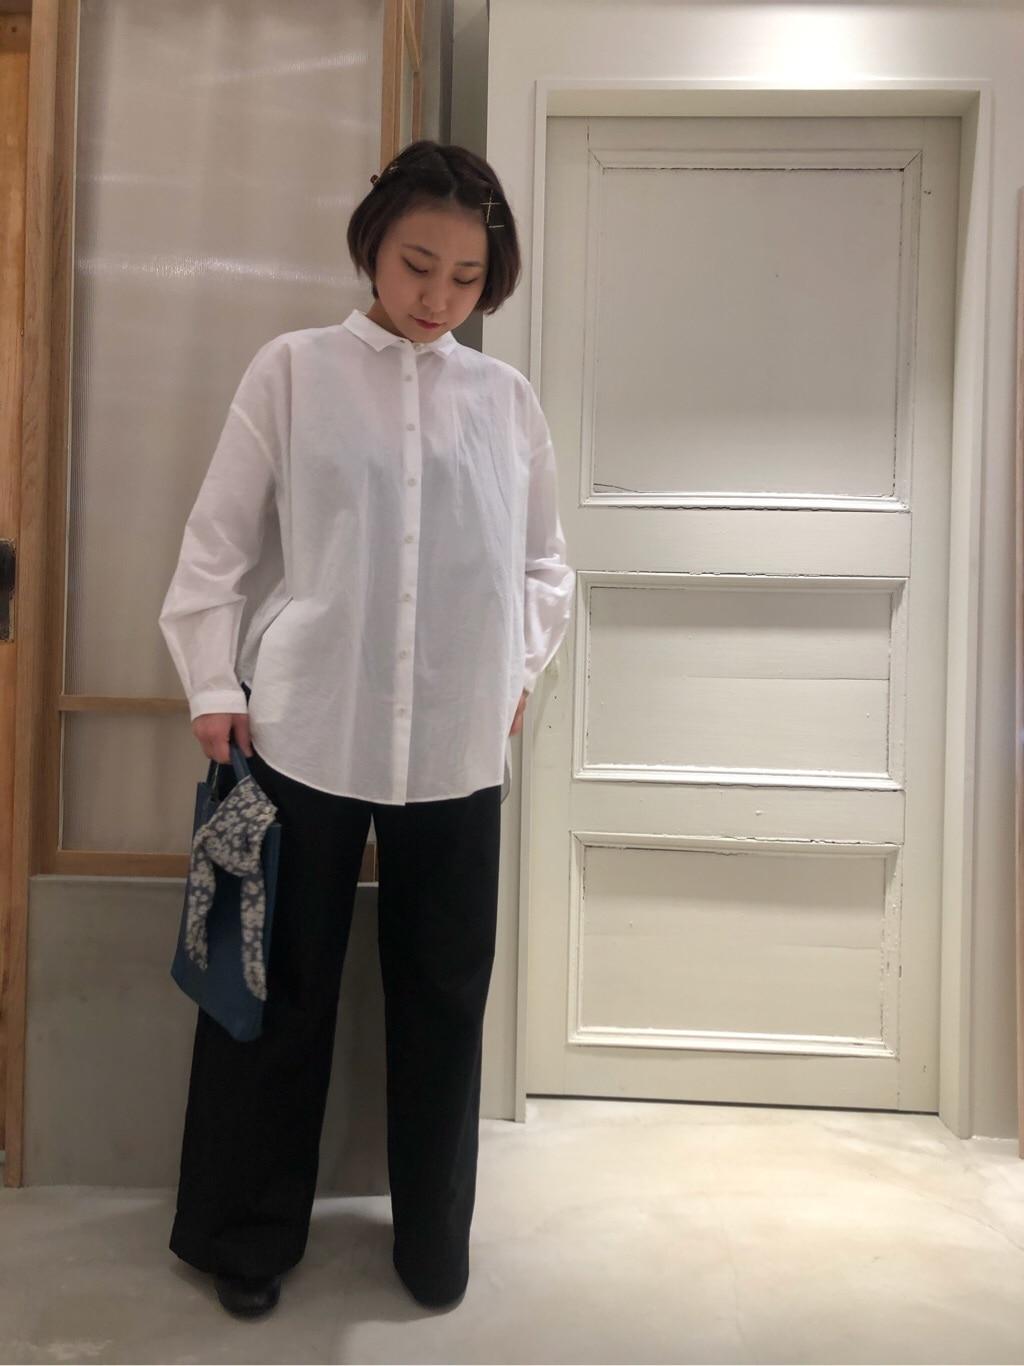 bulle de savon 渋谷スクランブルスクエア 身長:159cm 2020.02.13